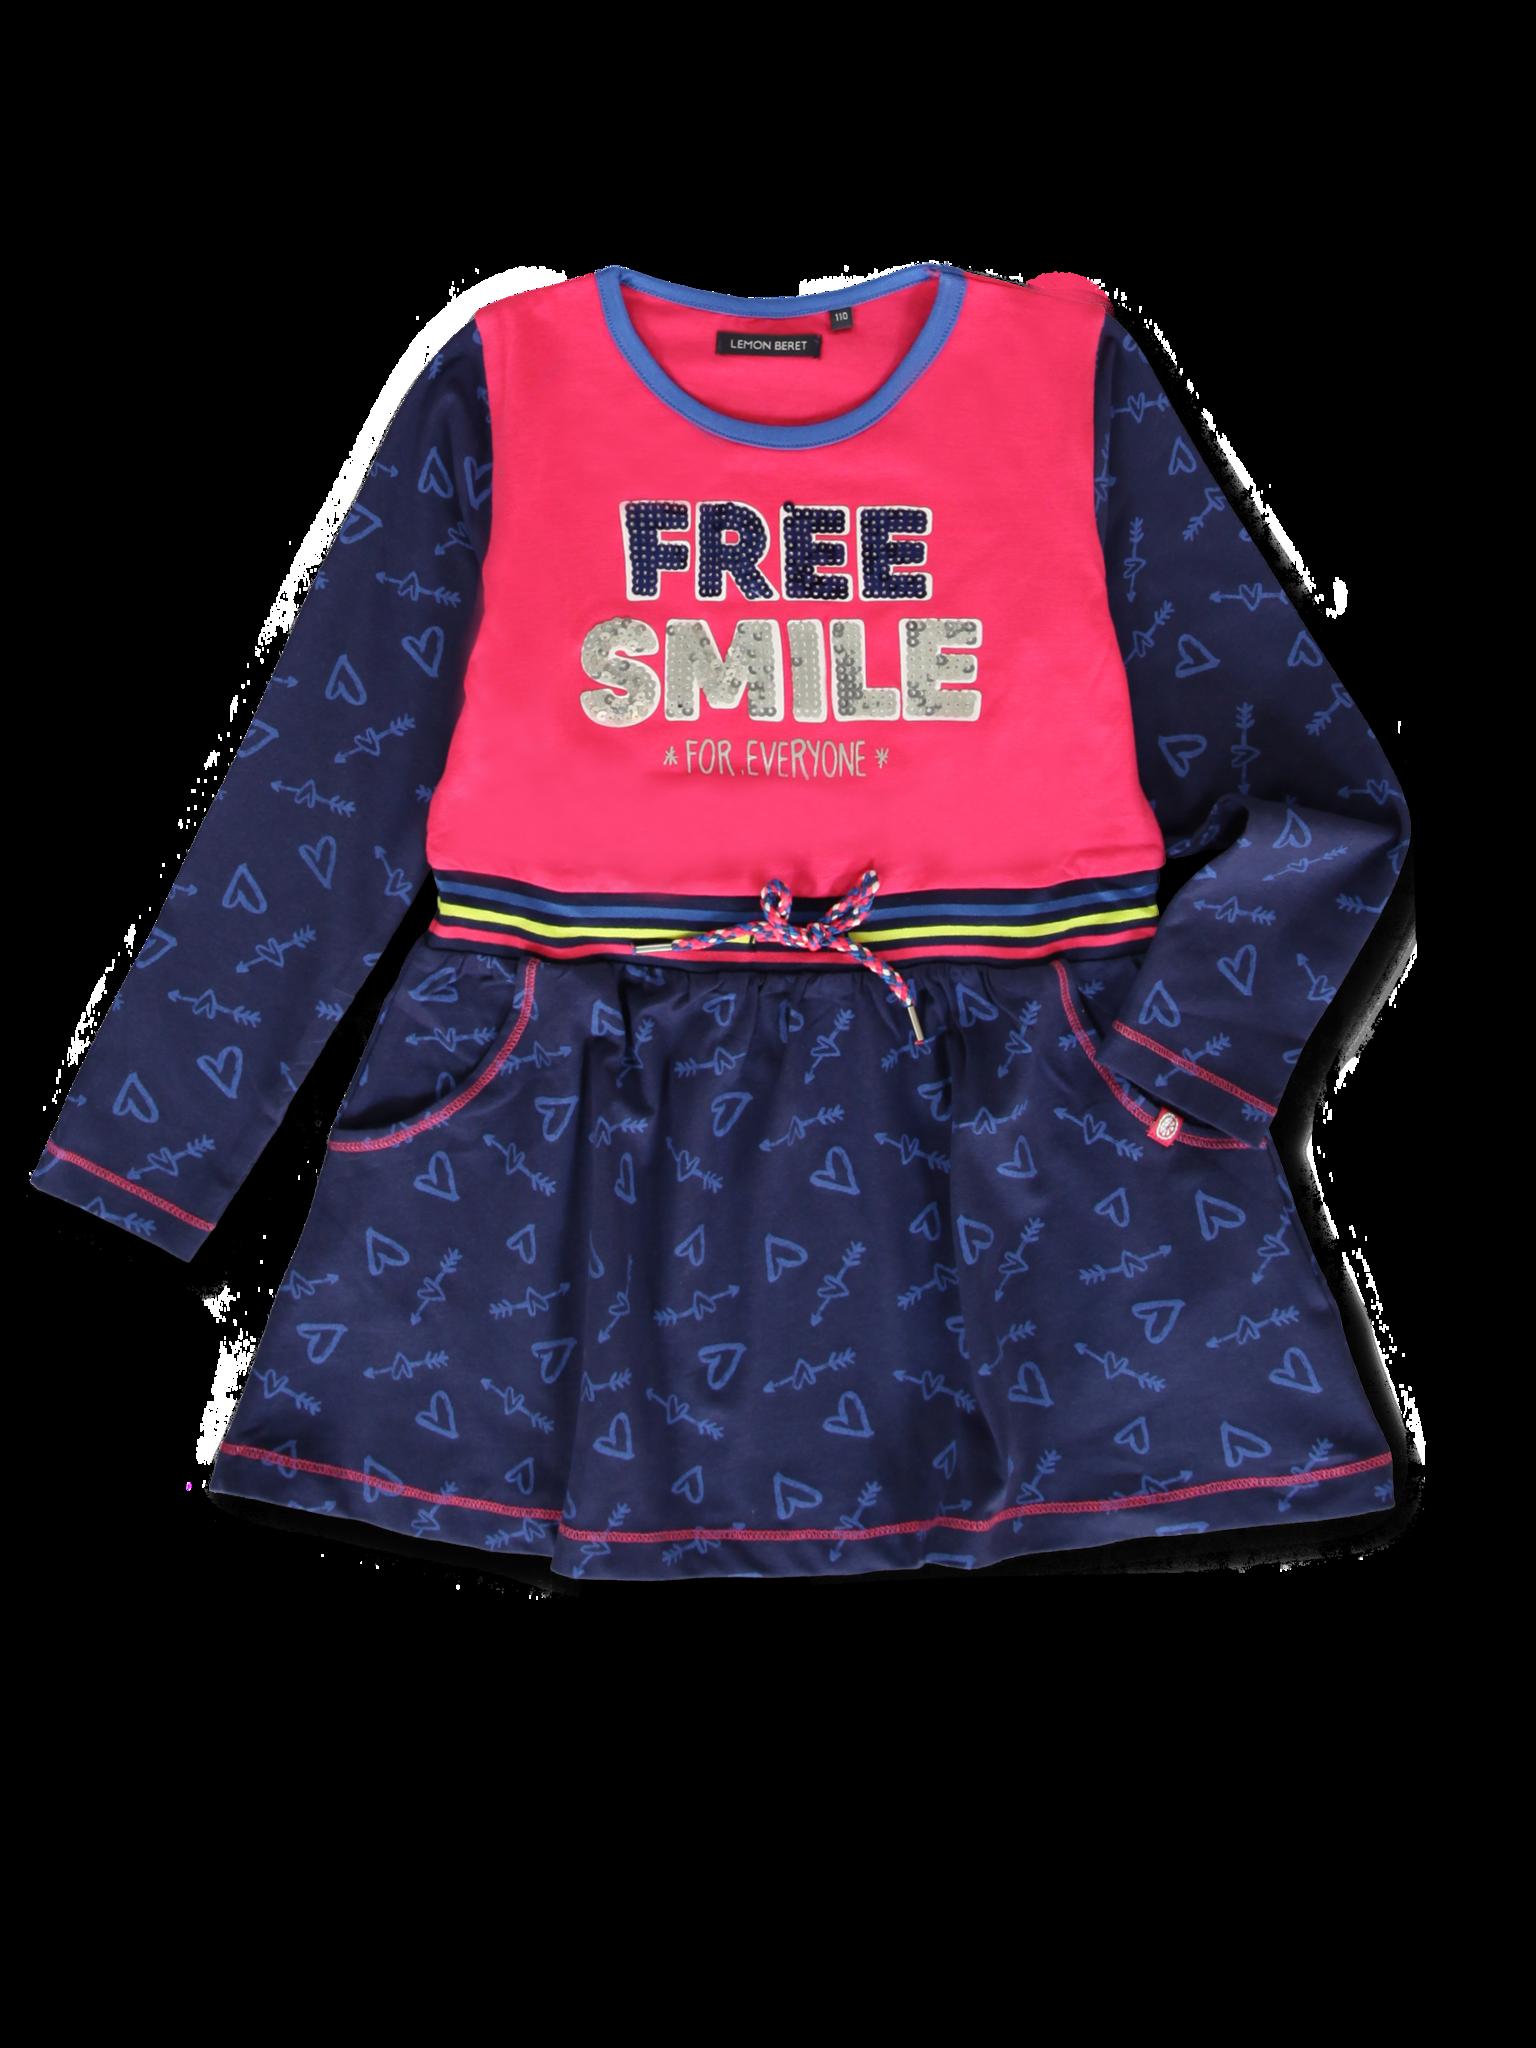 Lemon Beret | Winter 2019 Small Girls | Dress | 12 pcs/box